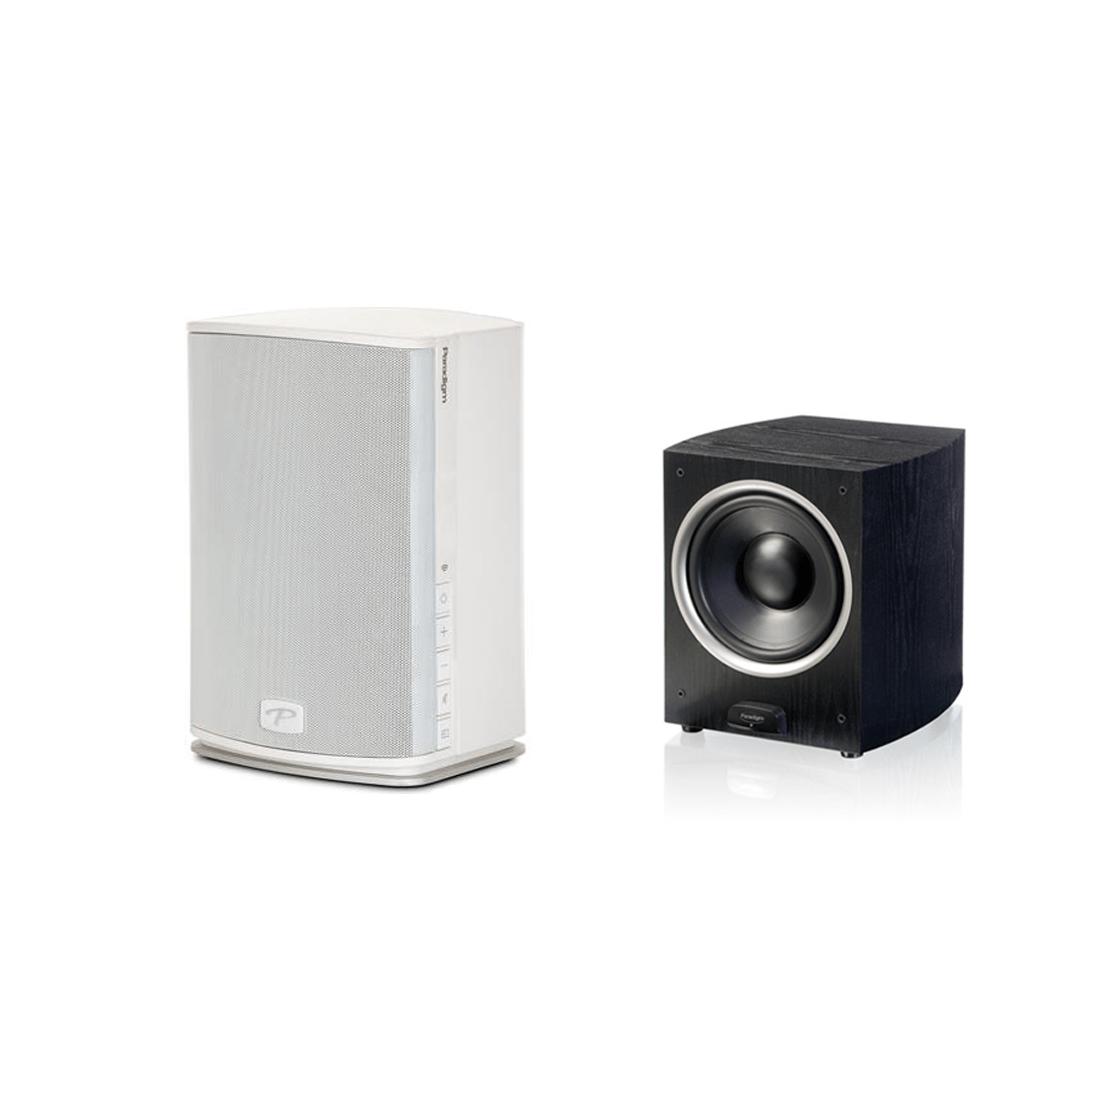 Paradigm PW 600 Premium Wireless Compact Stereo Speaker | PDR-100 ...